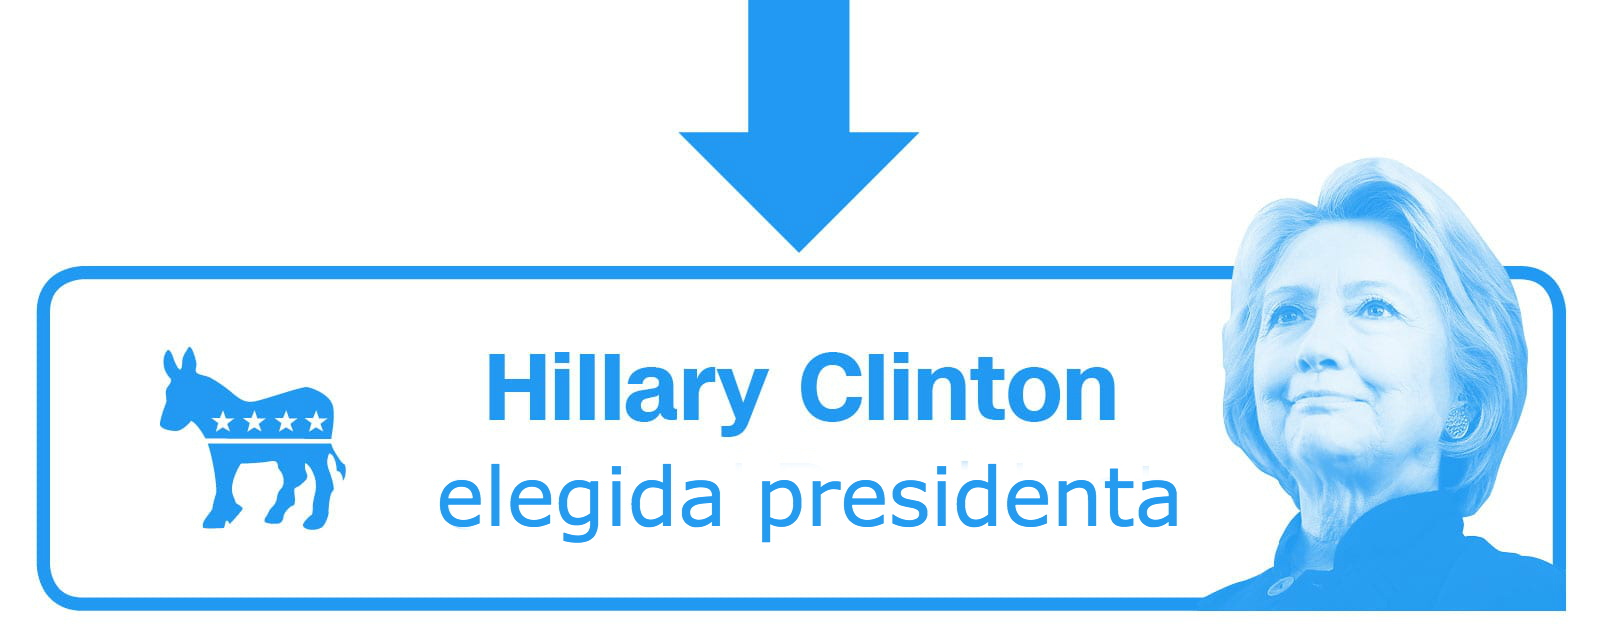 electoralcollege_infographic2_min